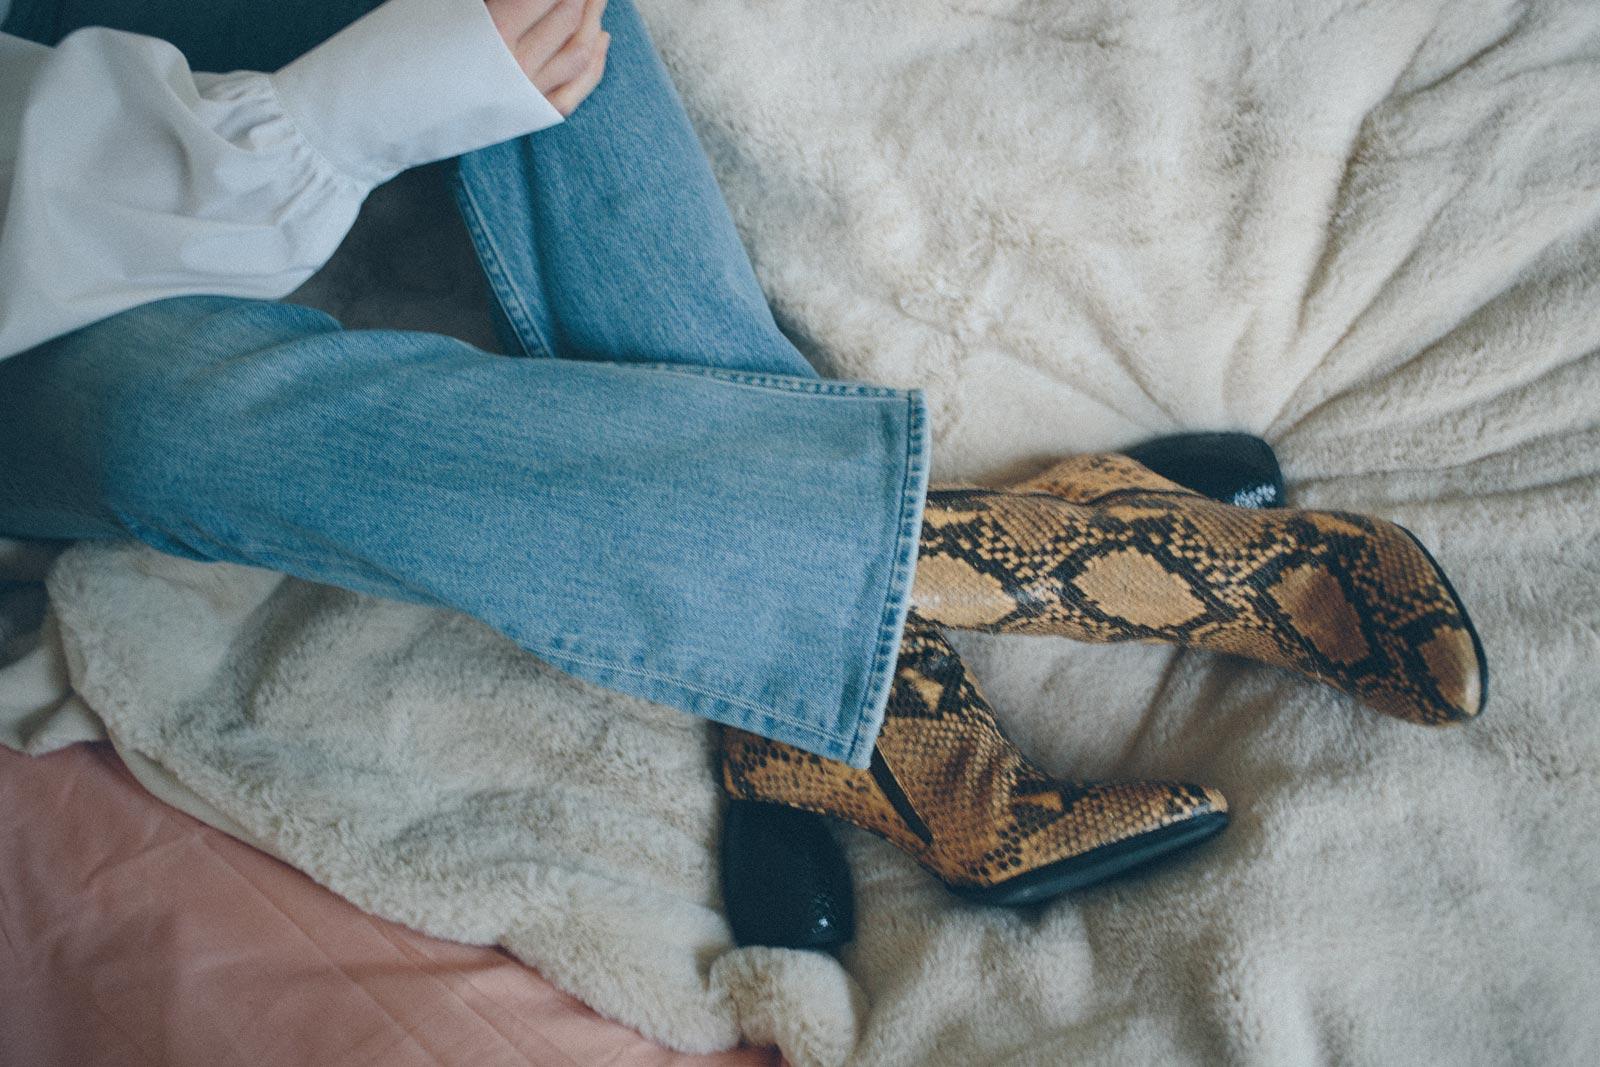 ruthvansoom-driesvannoten-snakeboots-fw16-outfit-4